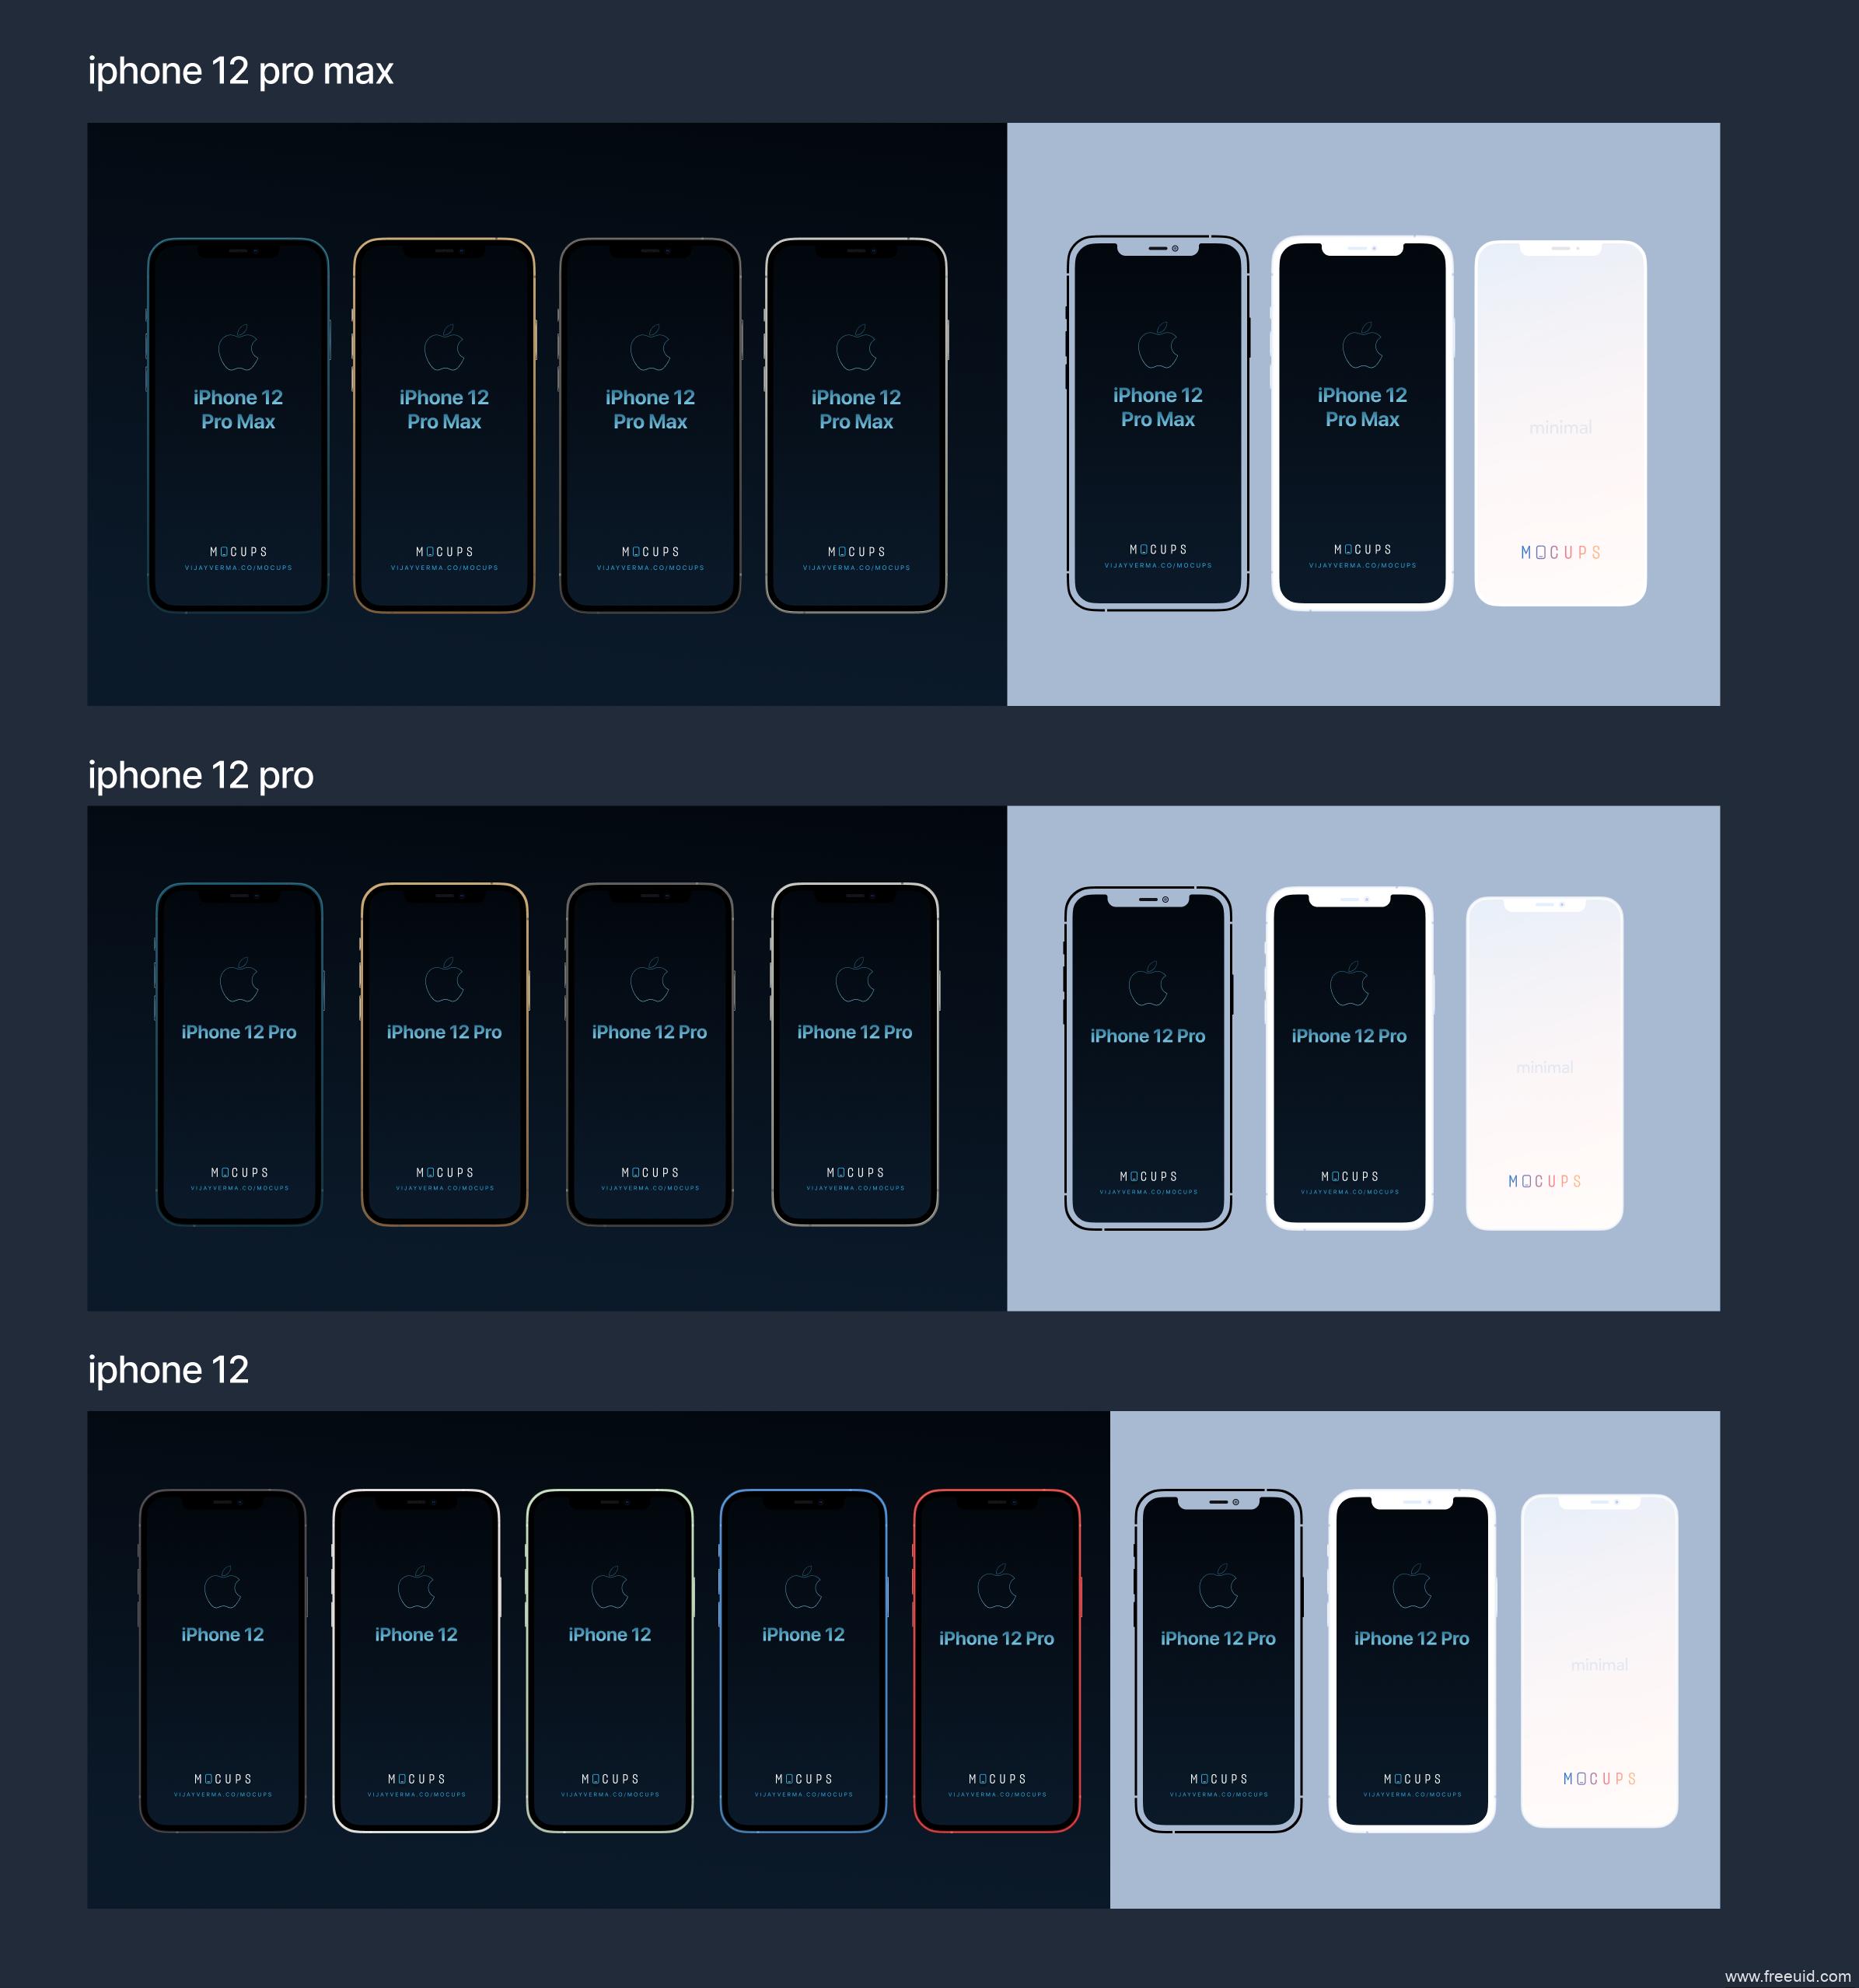 iphone 12全系样机mockup样机下载,iPhone12 pro max样机模板源文件,iPhone 12样机figma源文件下载